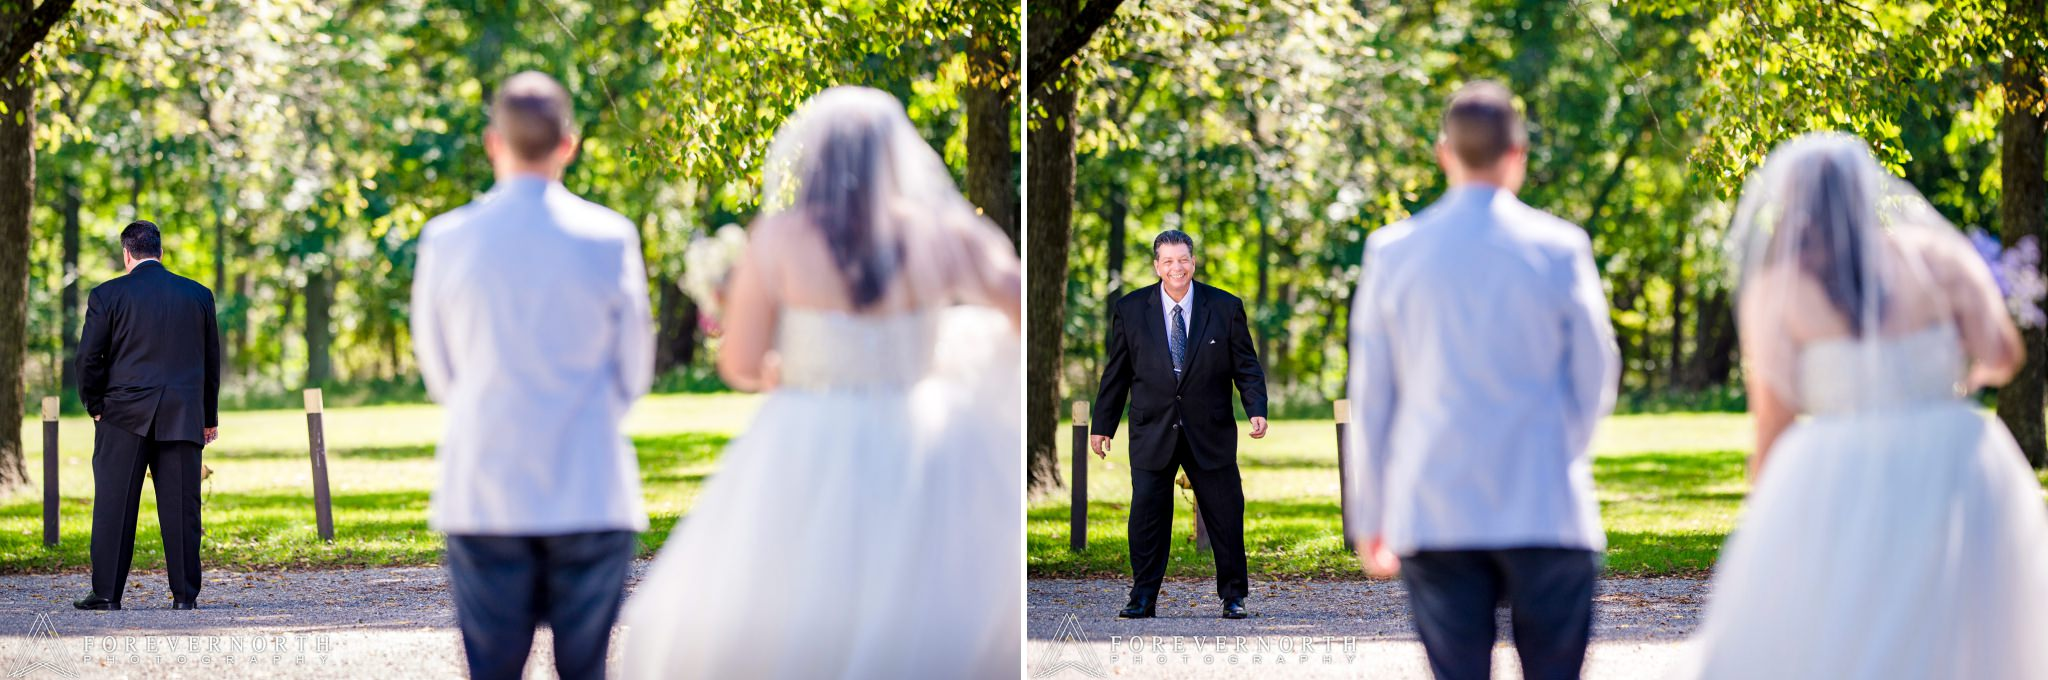 Brown-Allaire-State-Park-Wedding-Photographer-47.JPG